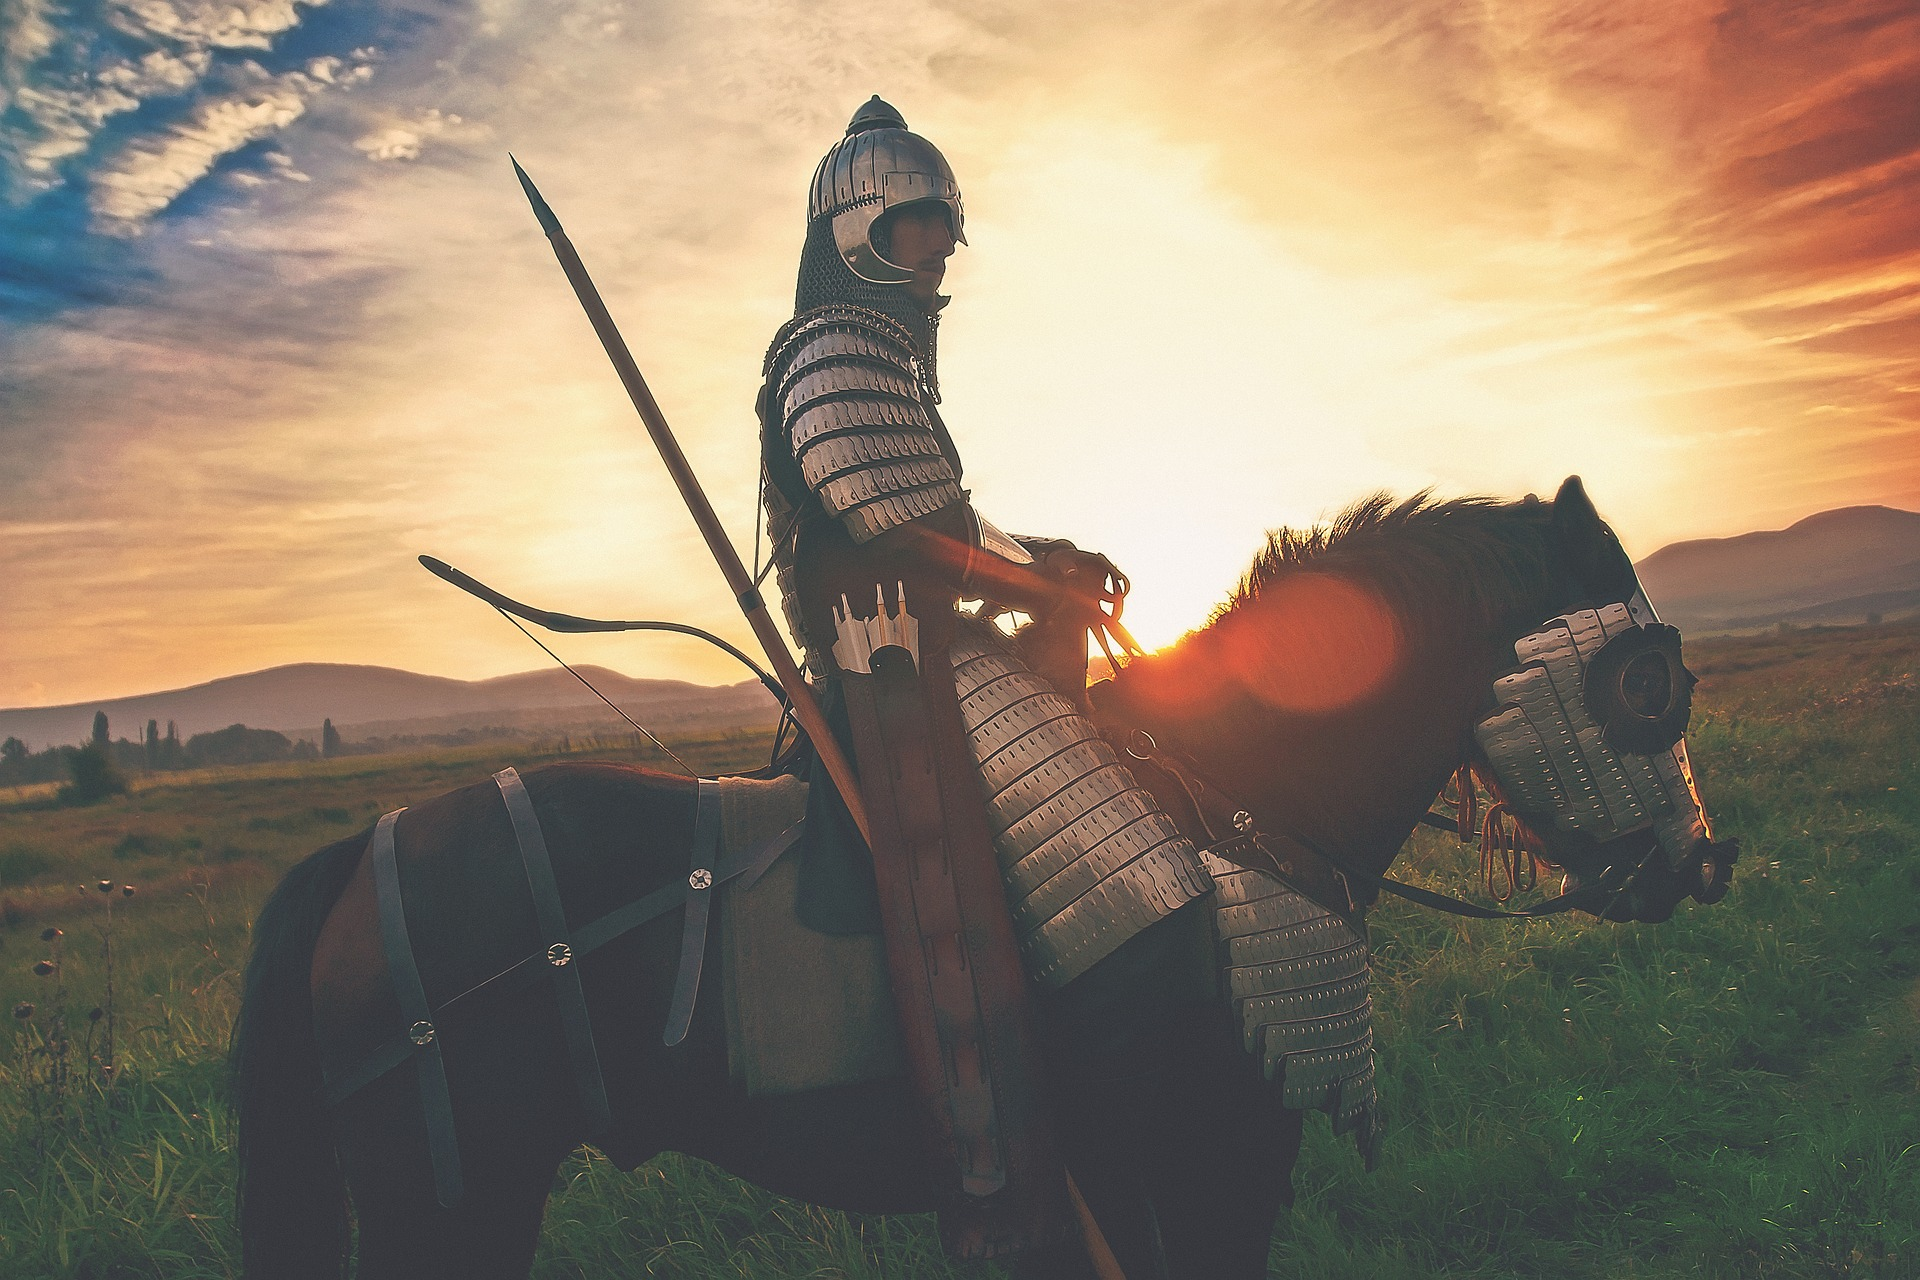 horse-soldier-2565957_1920